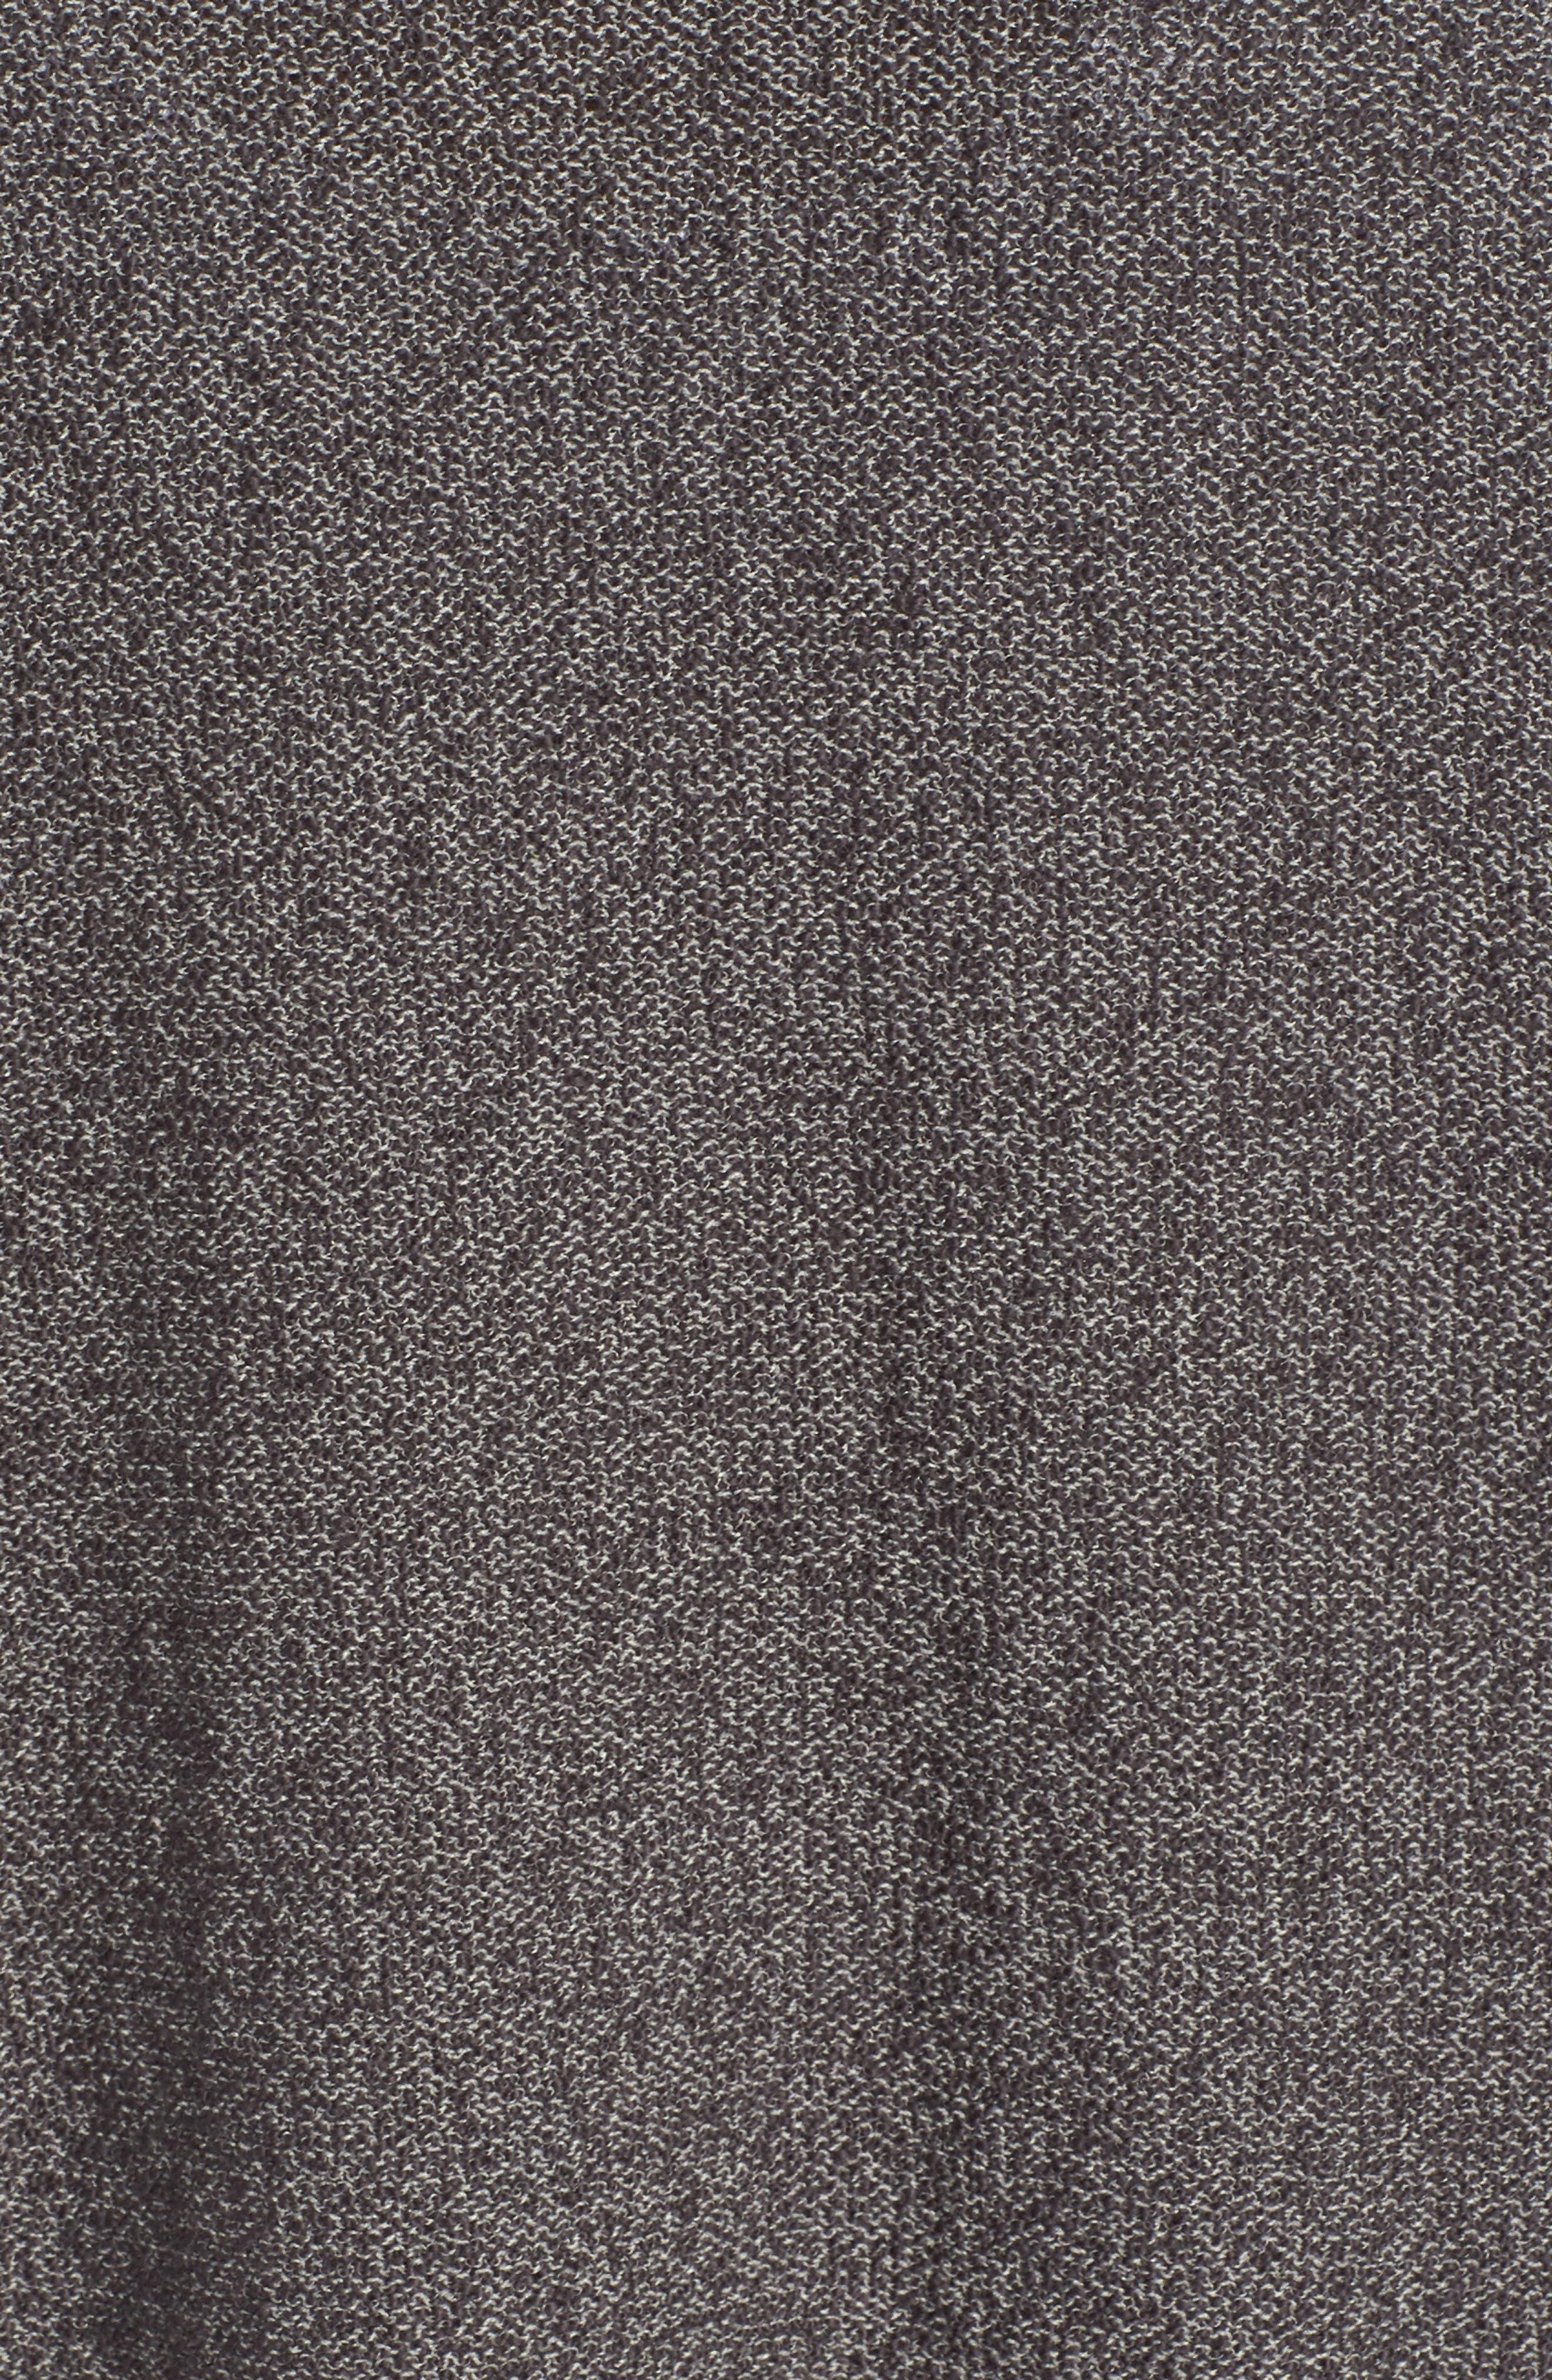 Lunar Surplice Sweater,                             Alternate thumbnail 5, color,                             020